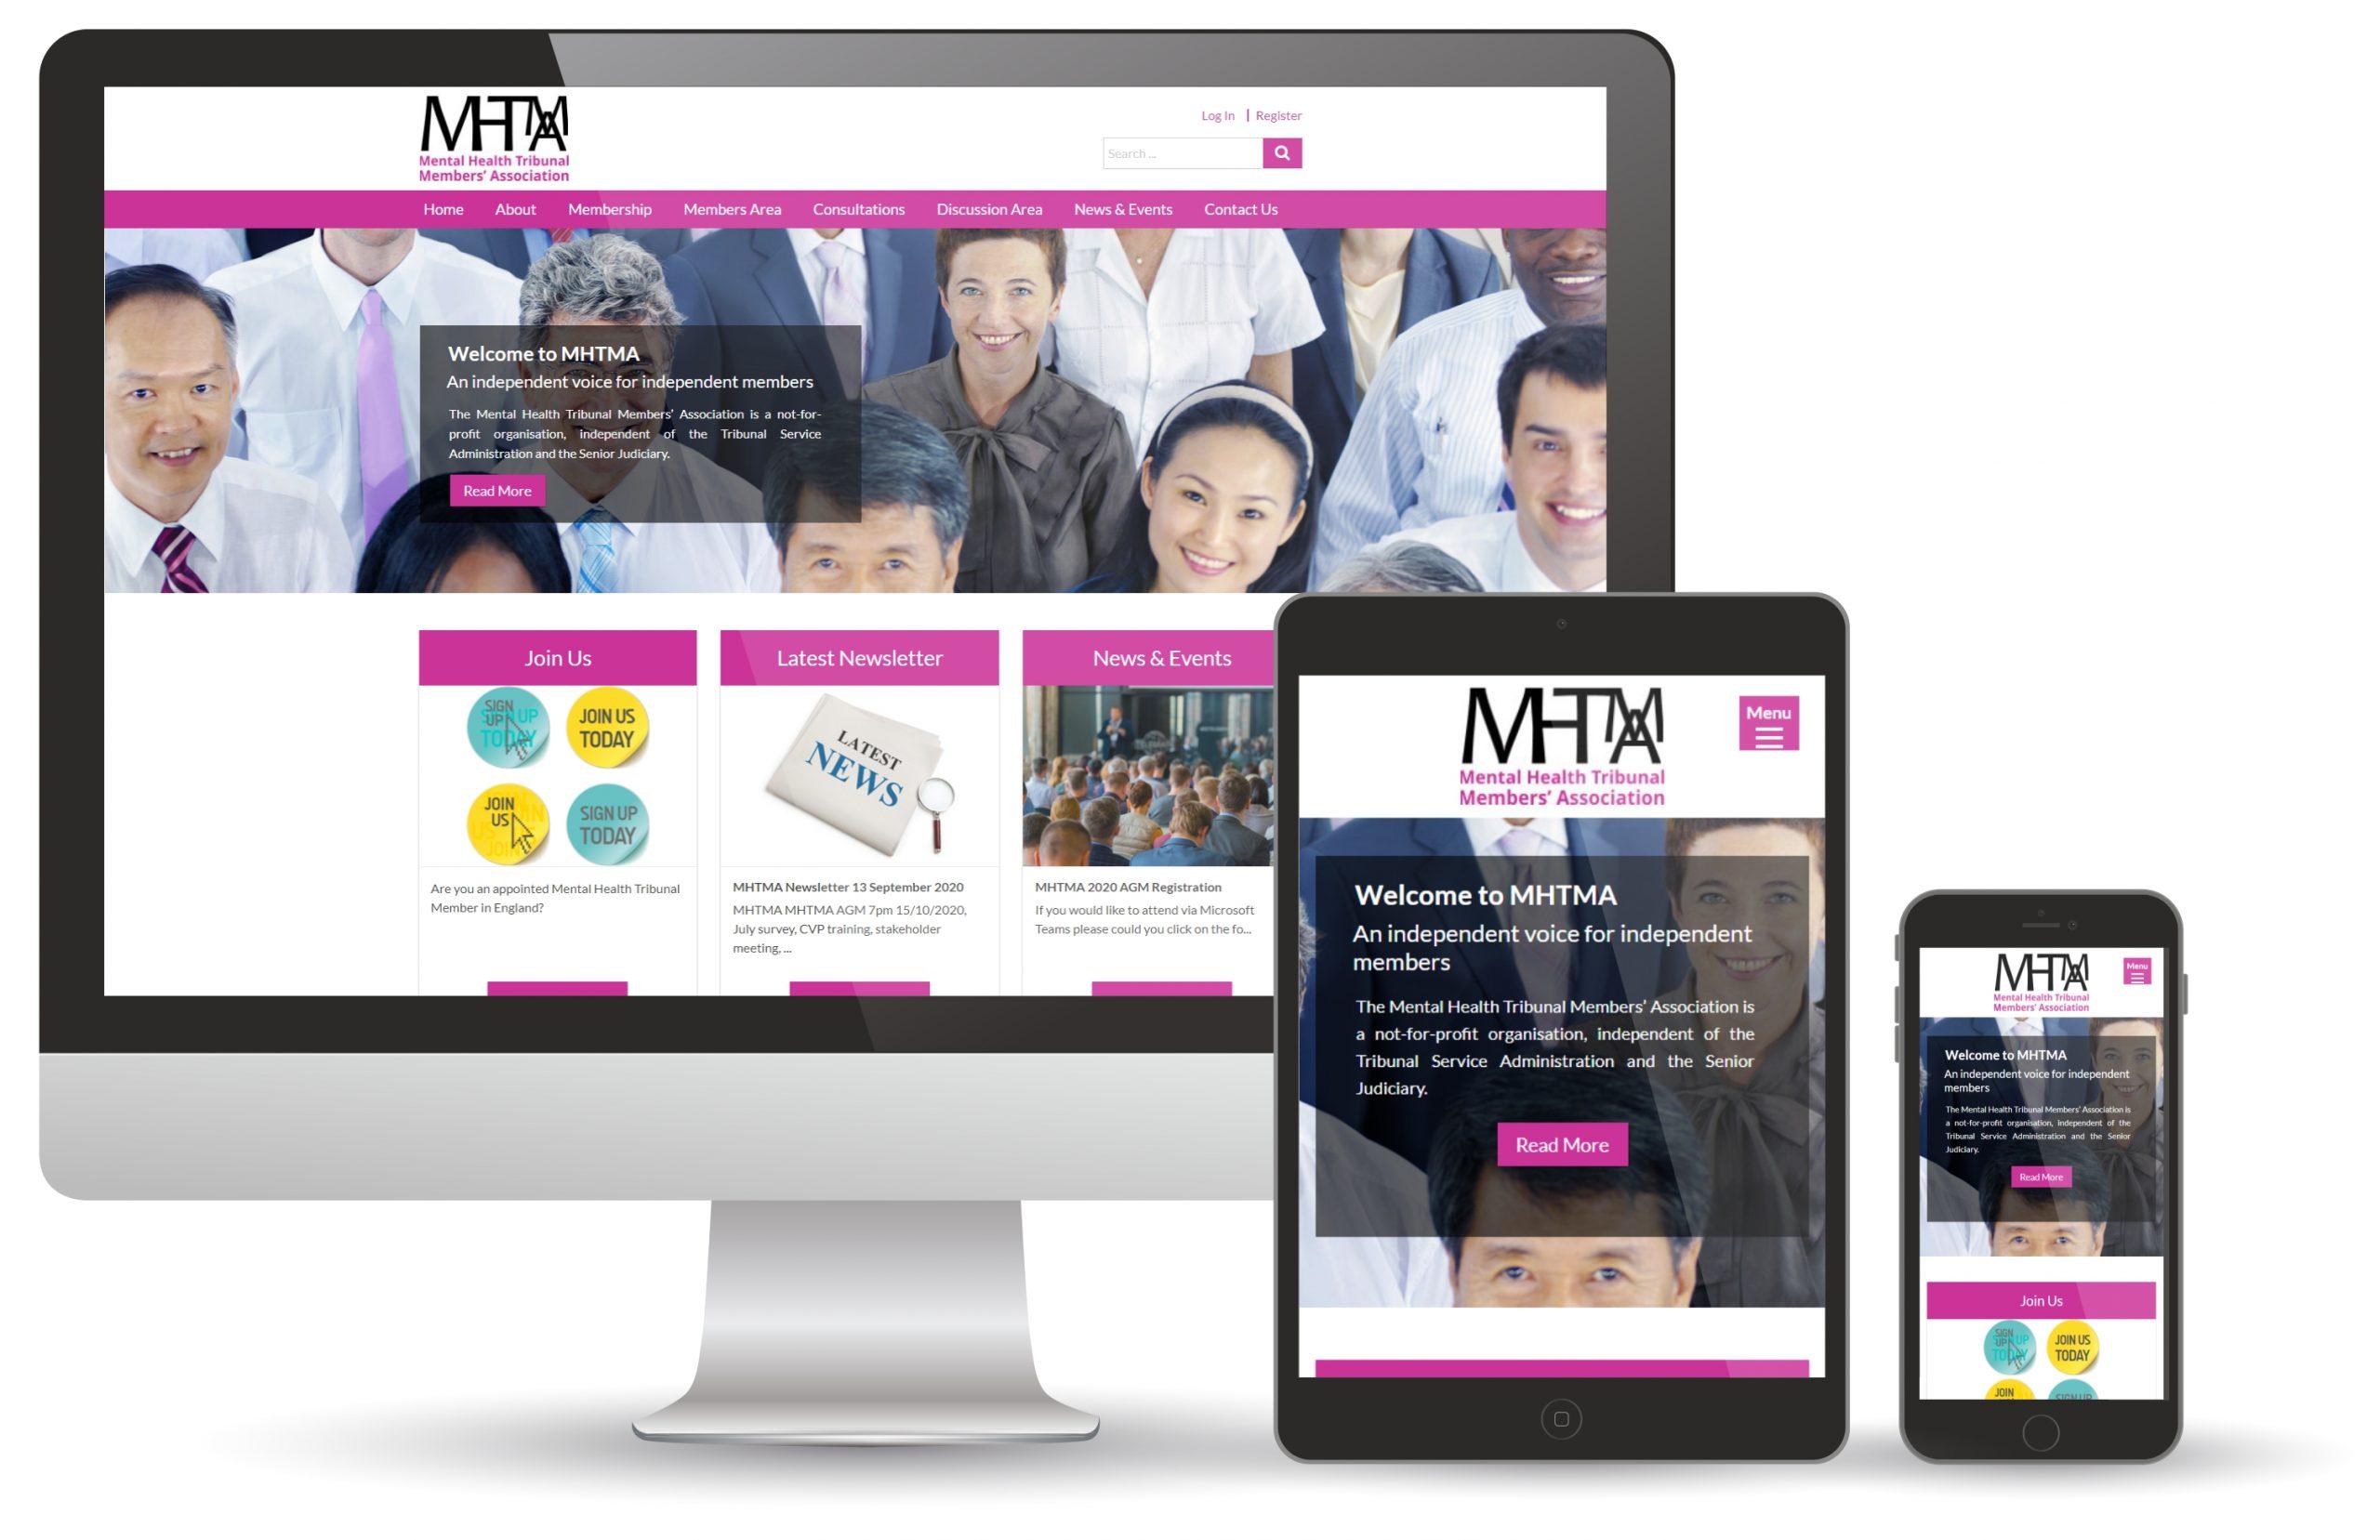 MHTMA Mockup